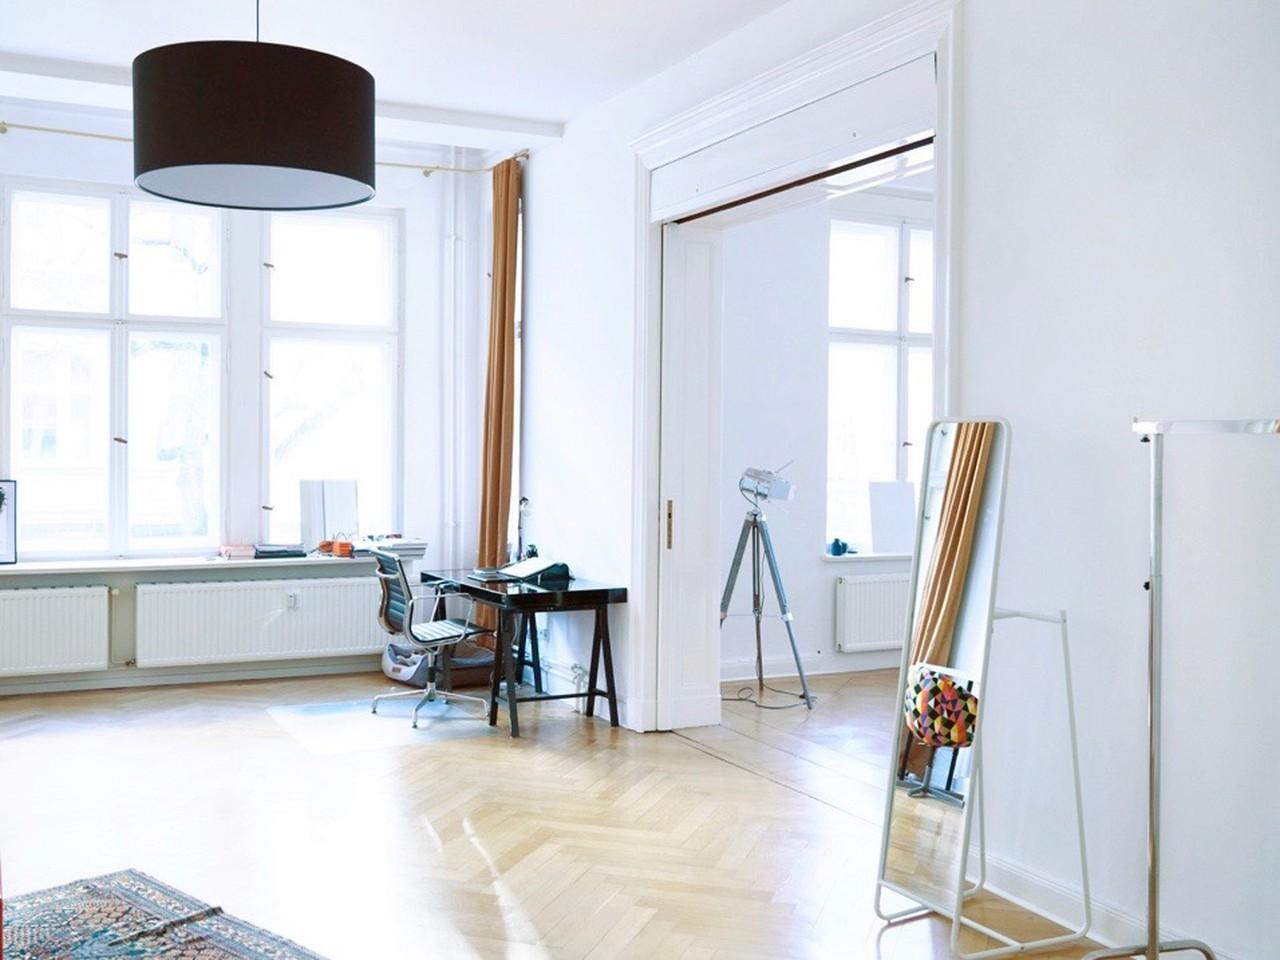 Berlin Fotostudio  Studio Daki image 0